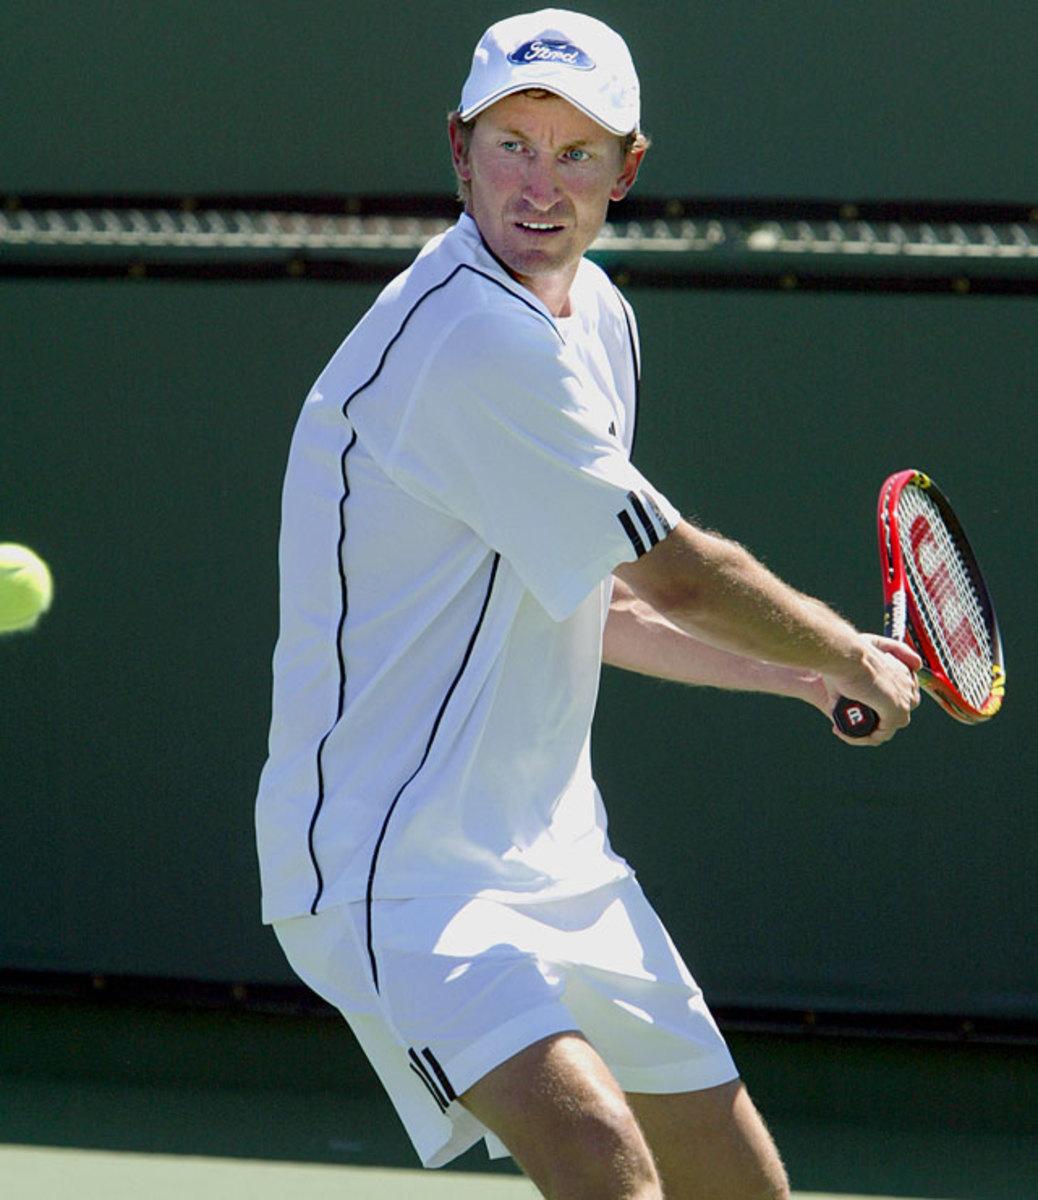 130809100158-wayne-gretzky-tennis-single-image-cut.jpg